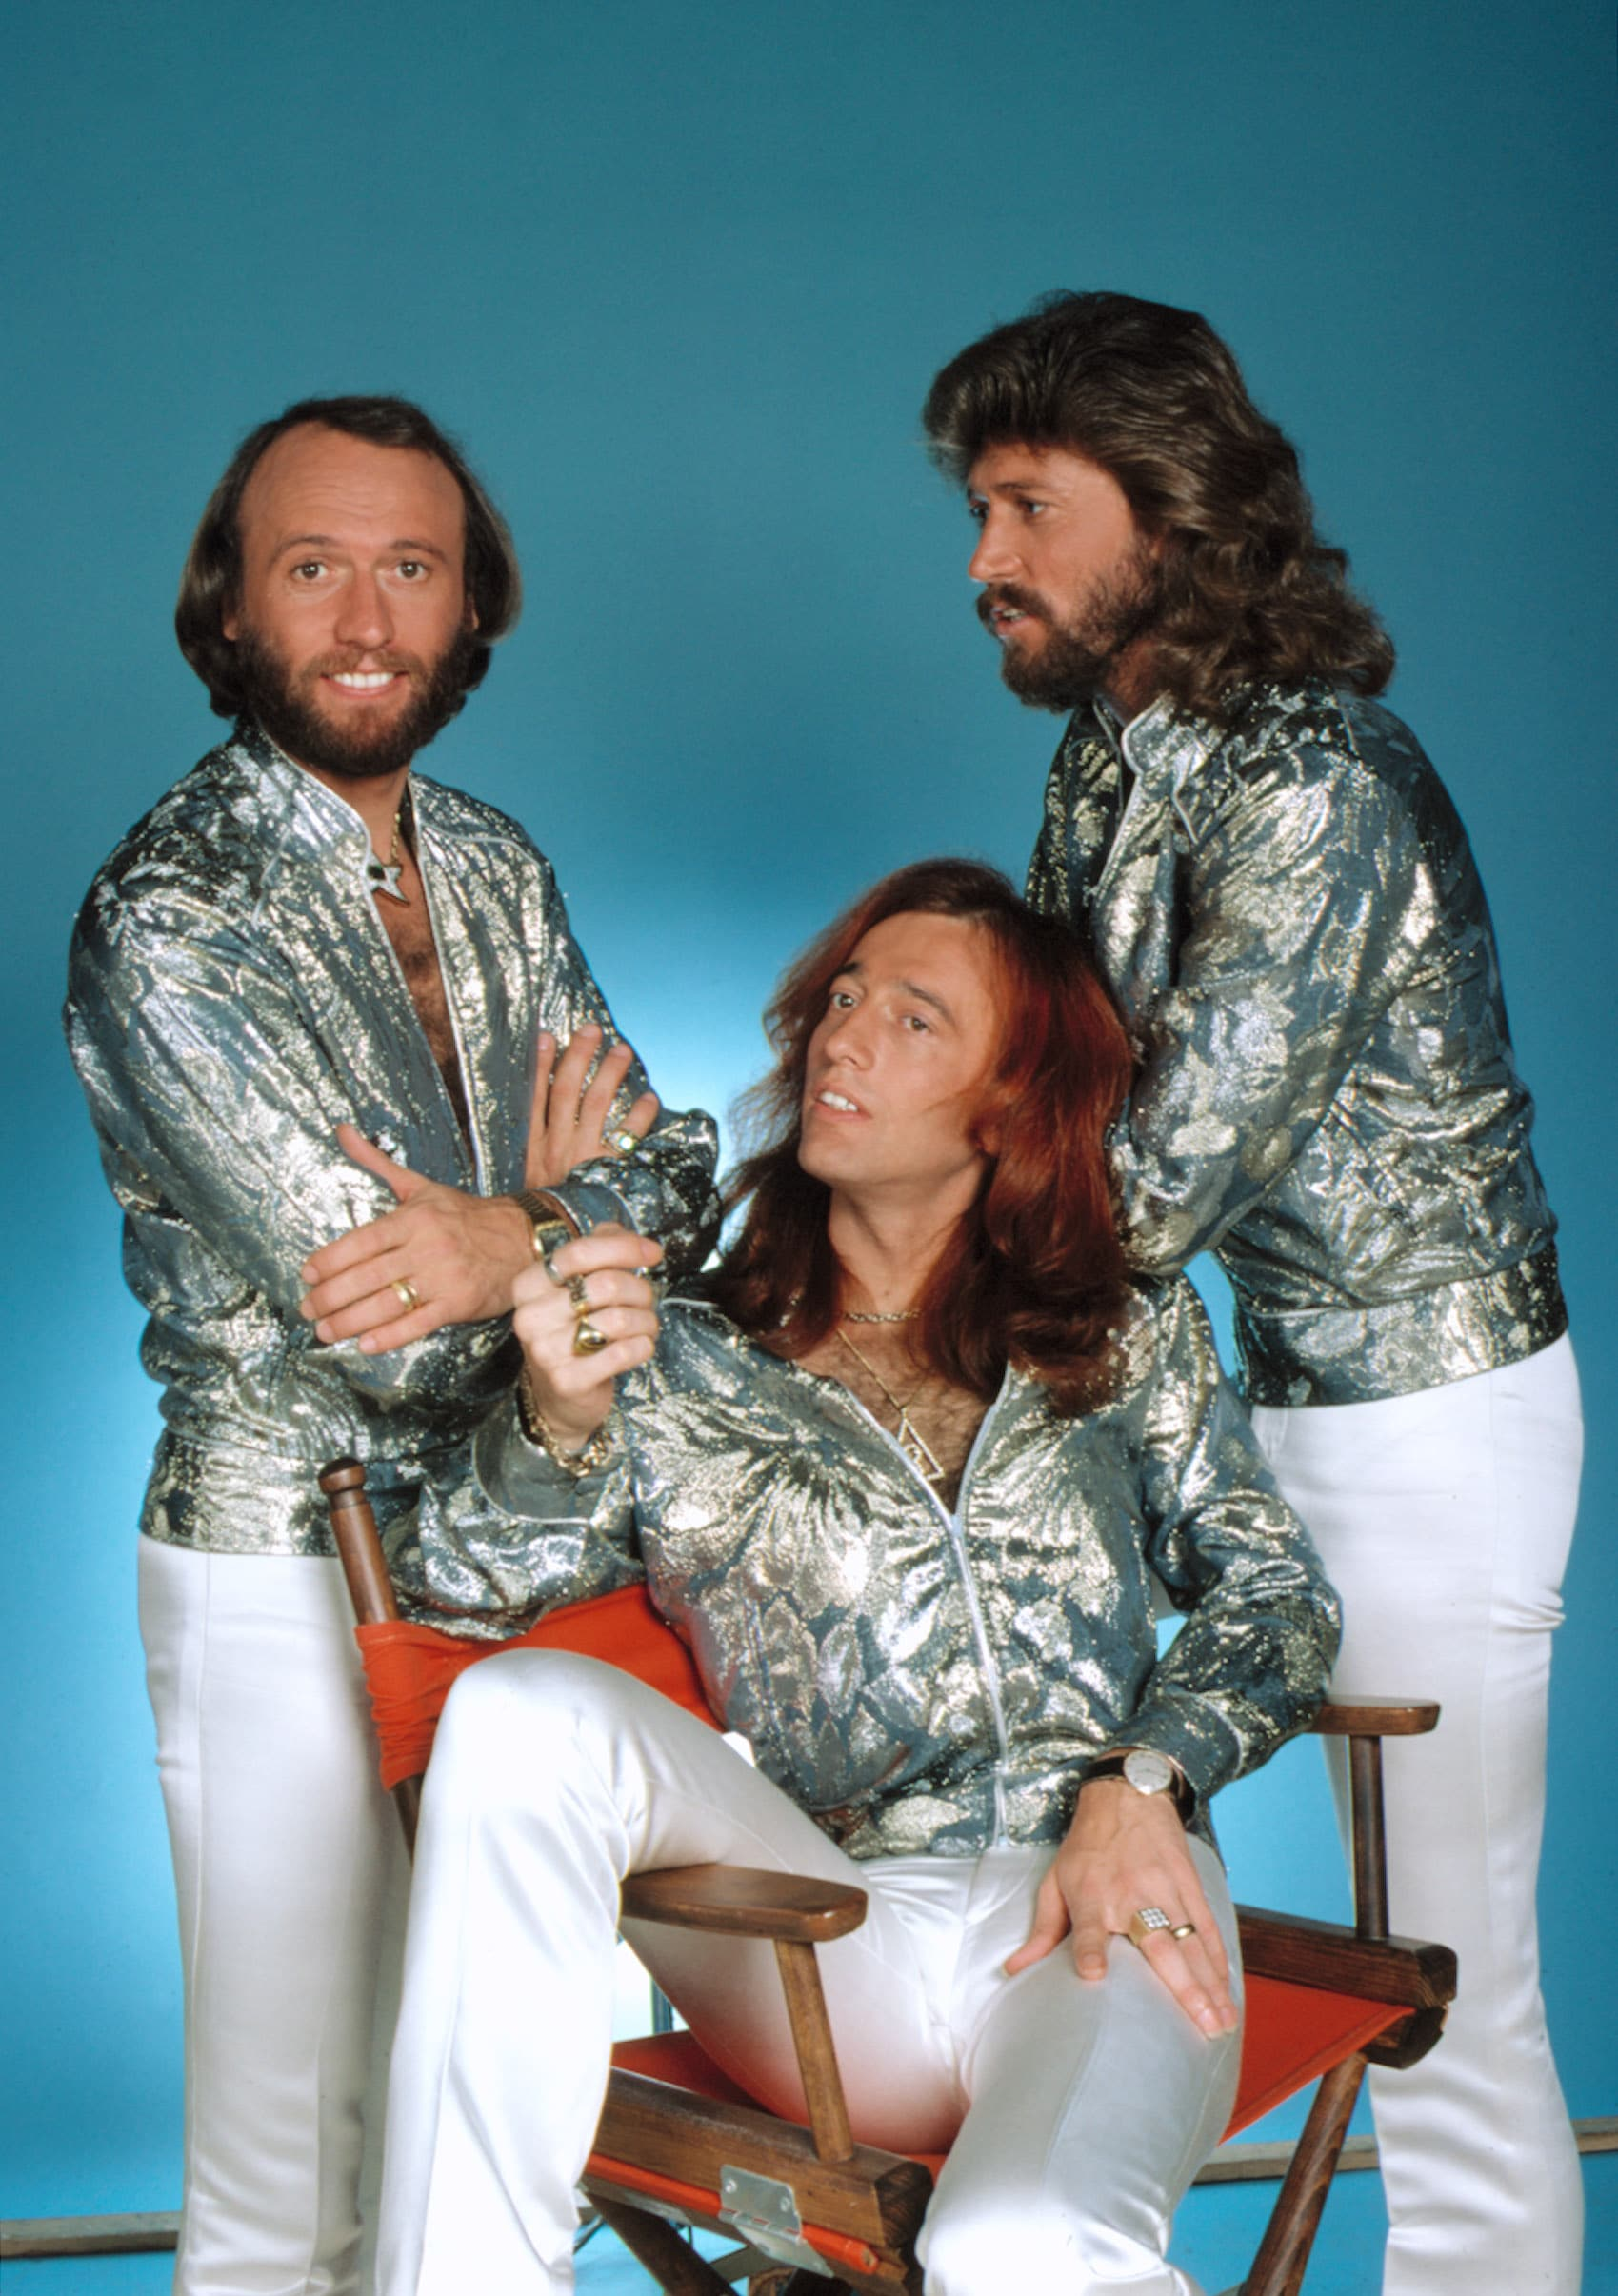 BEE GEES, (Maurice, Robin & Barry Gibb), circa 1978